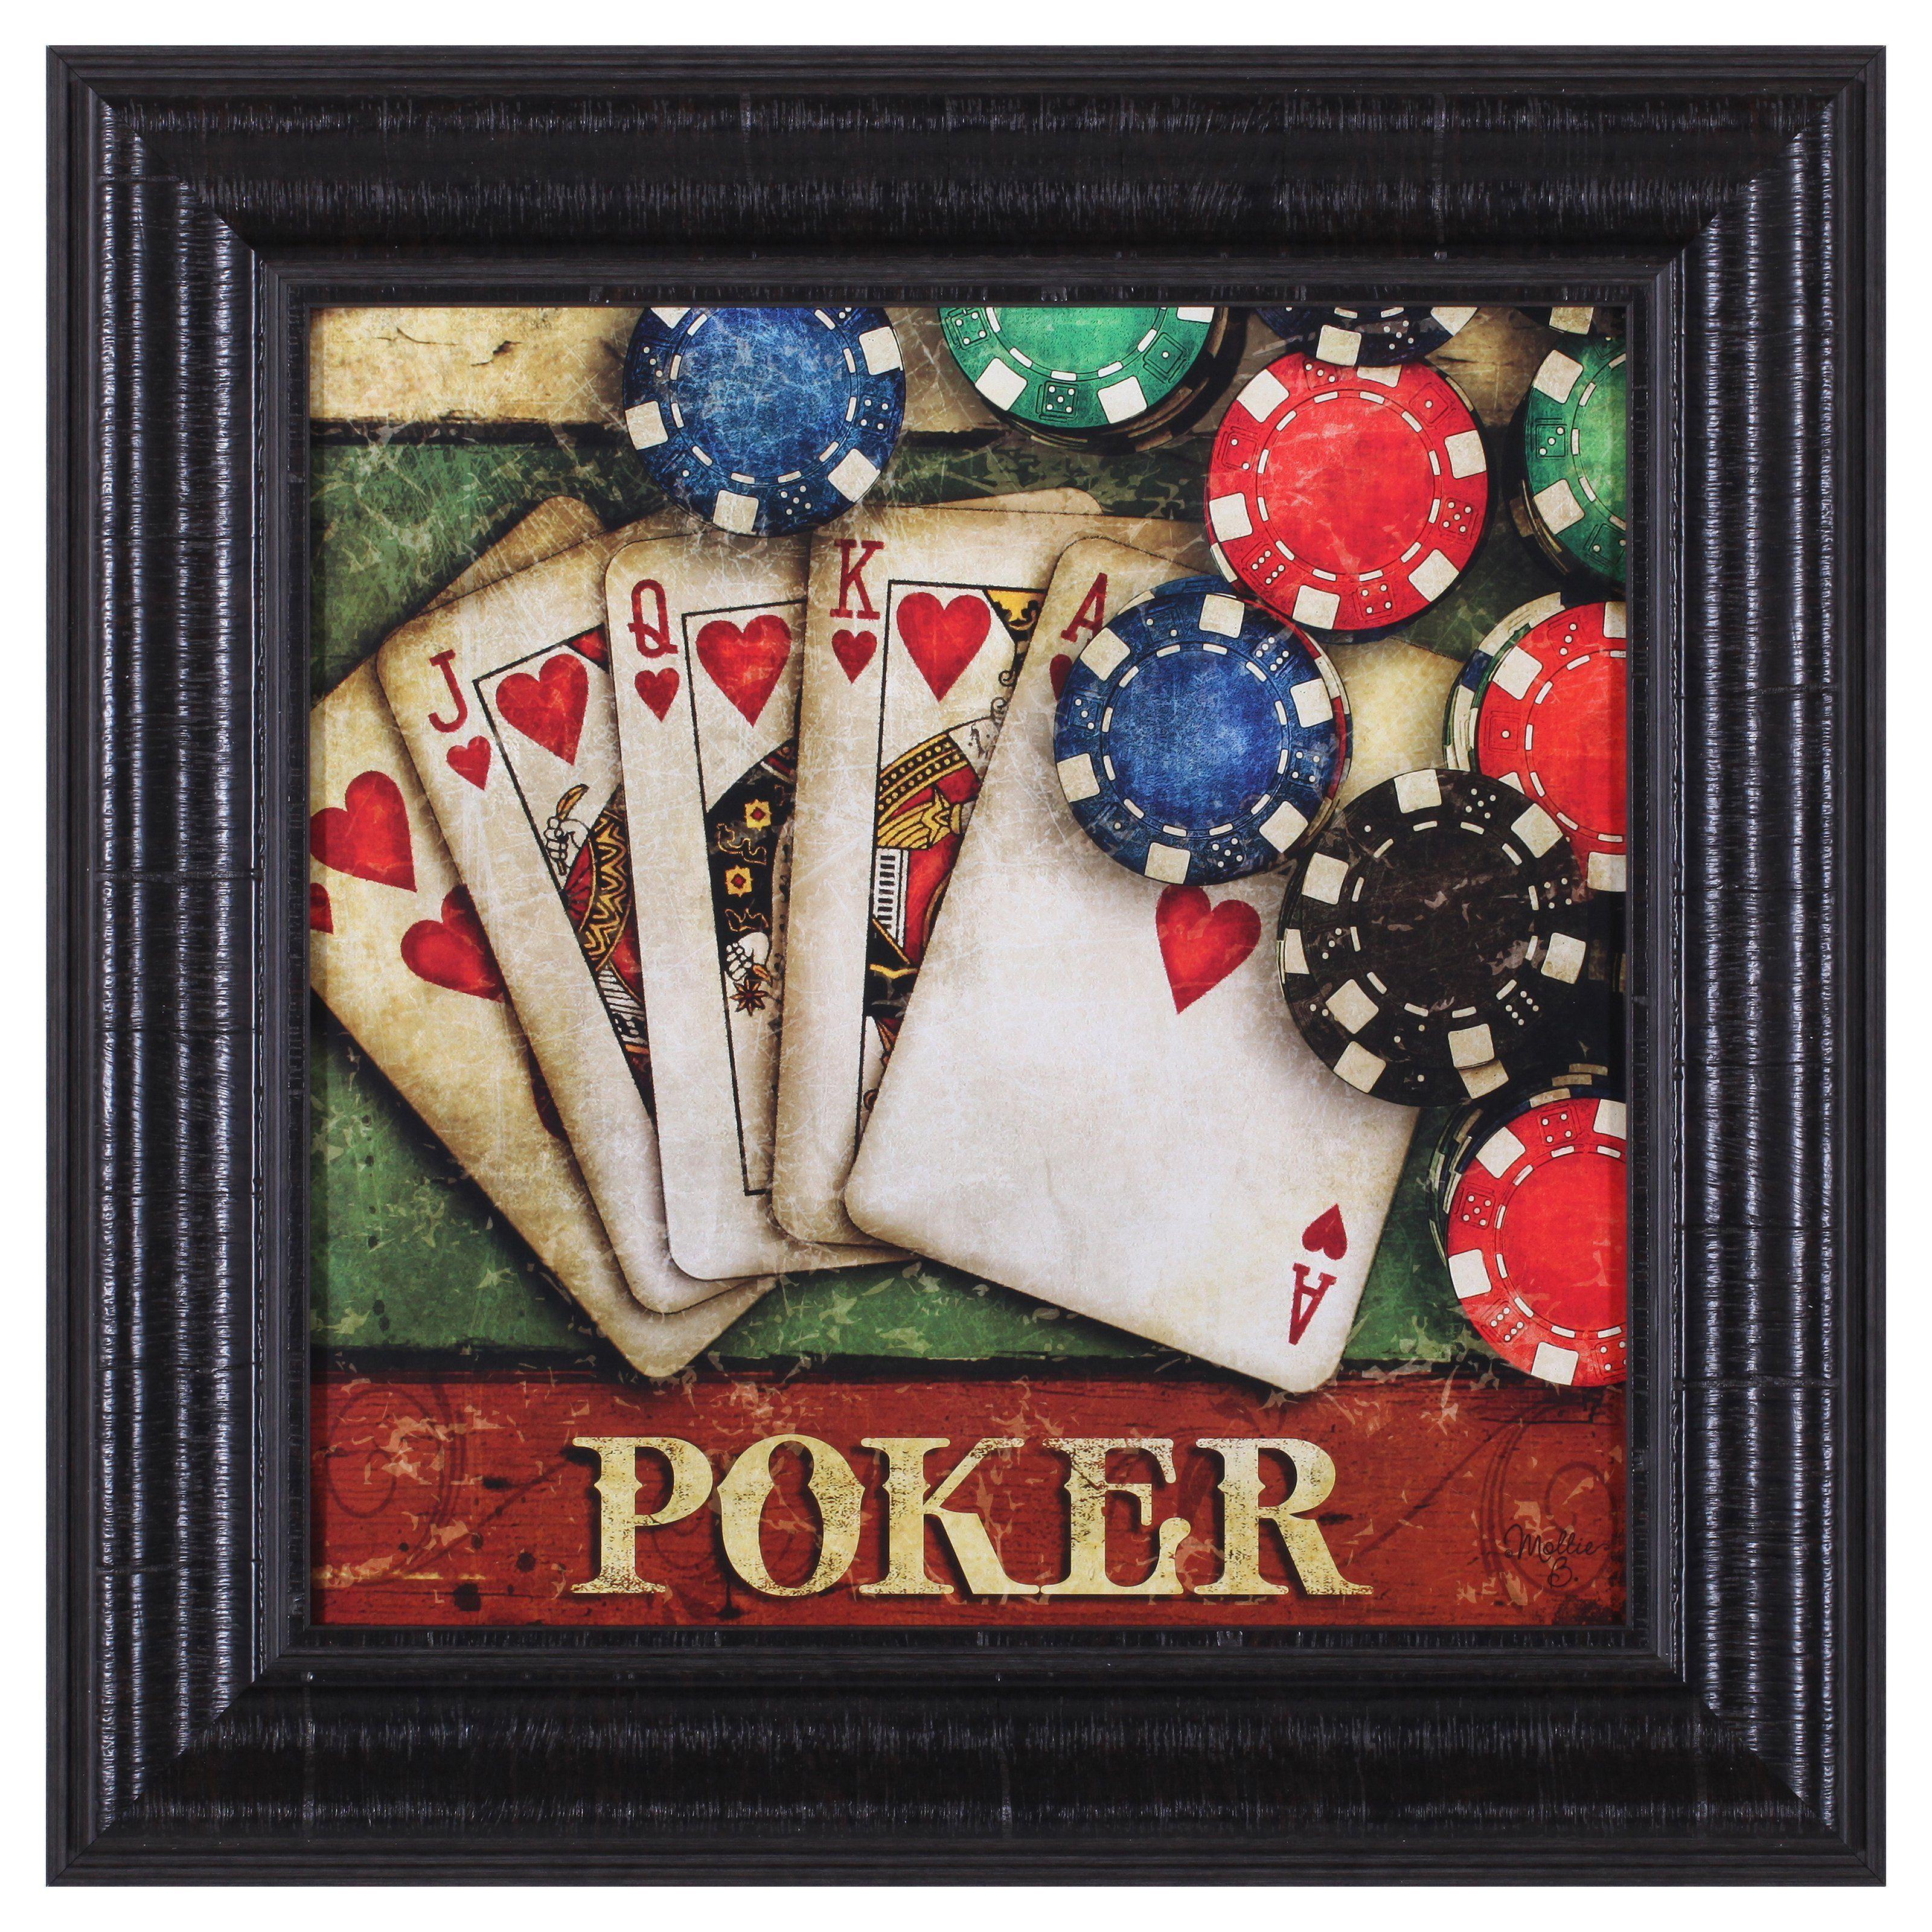 Art Effects Poker Framed Wall Art - H85215 | Framed wall ...